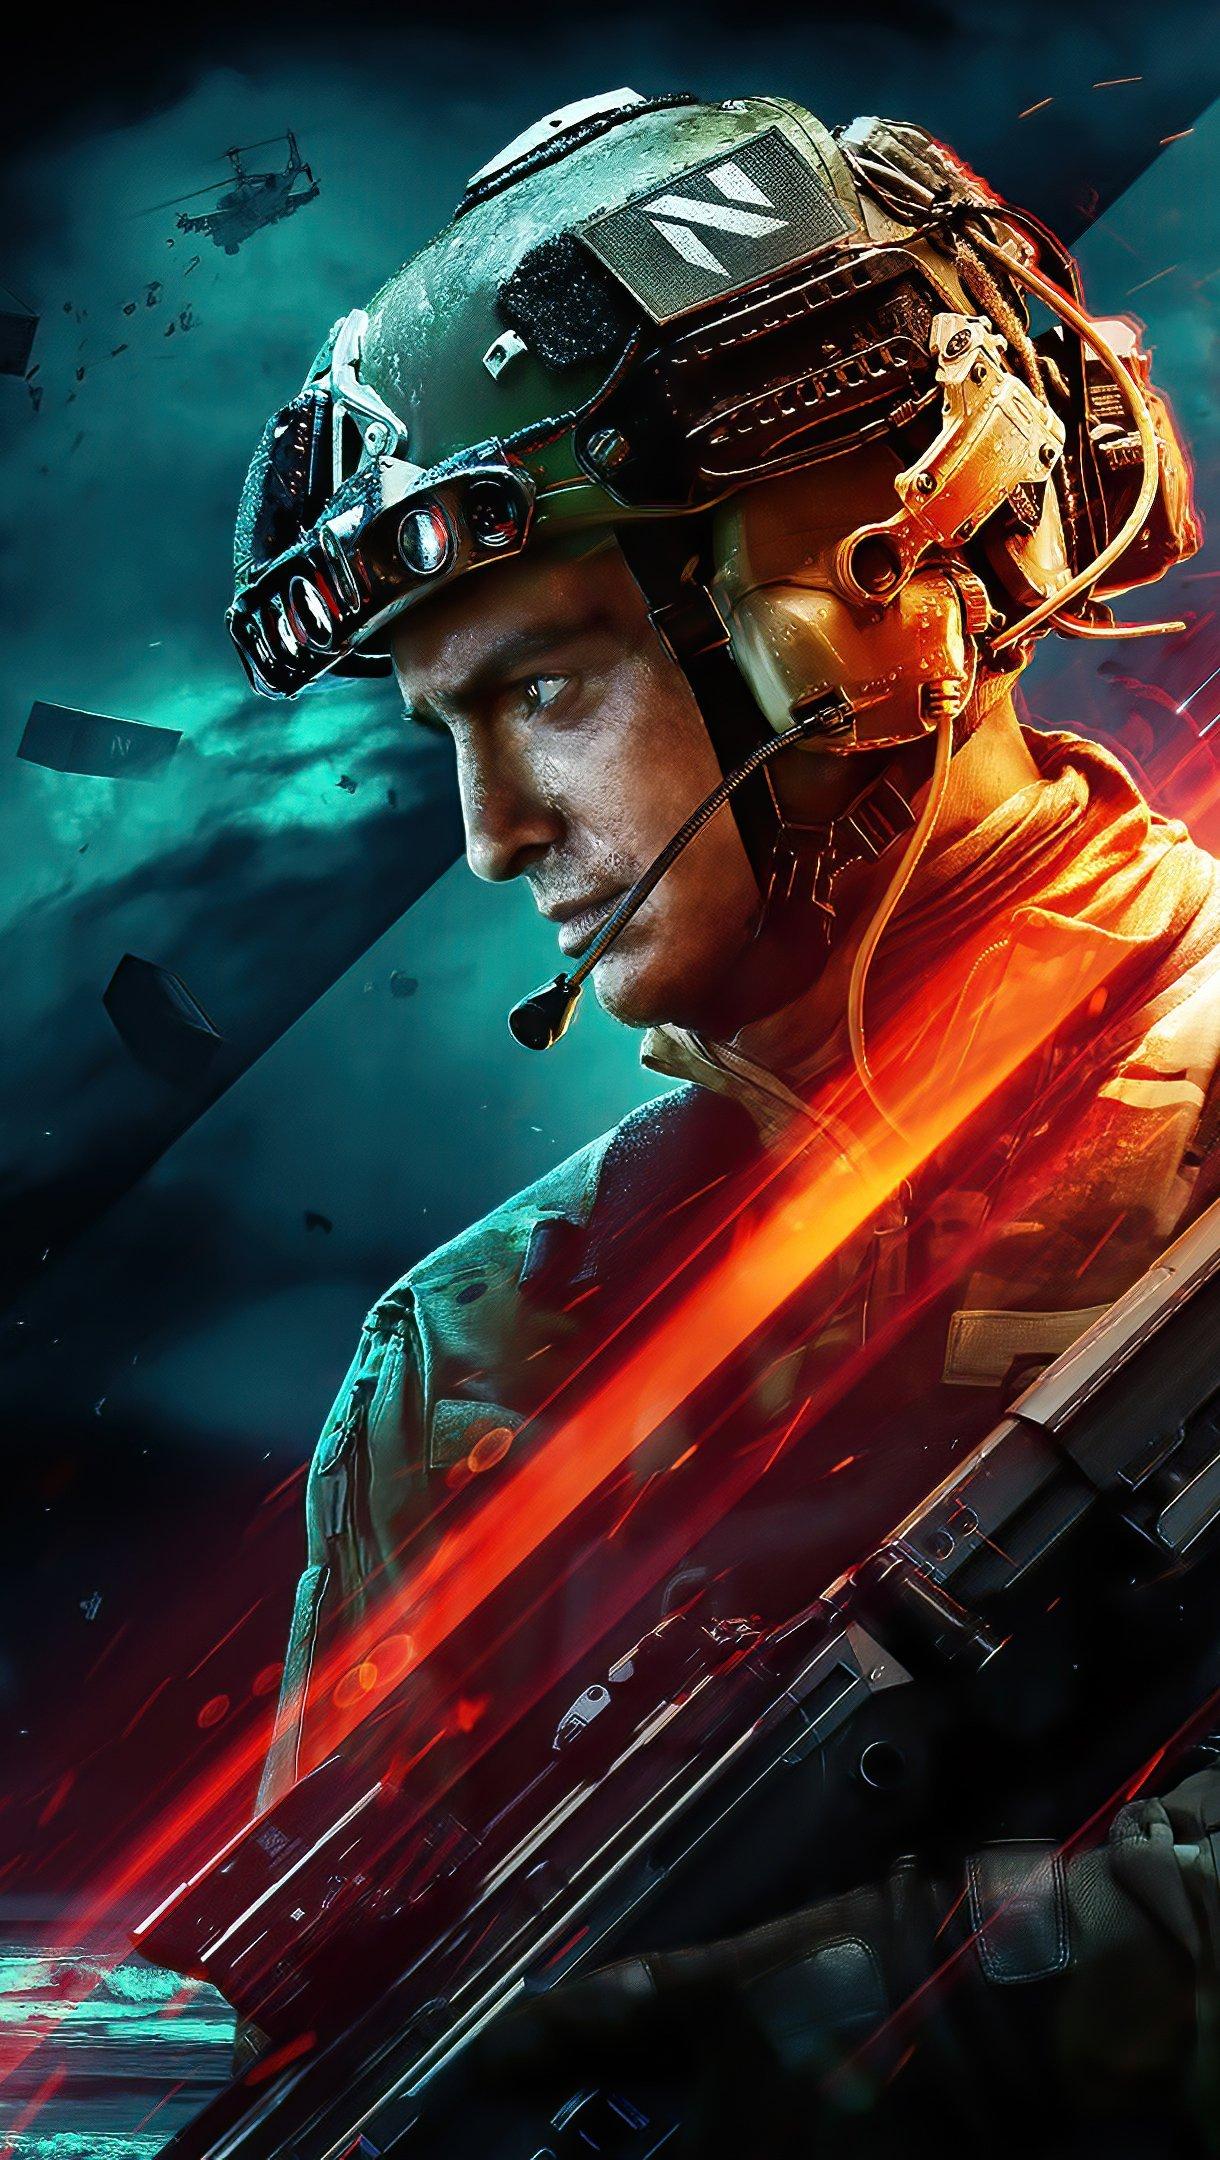 Fondos de pantalla 2021 Battlefield 2042 Vertical